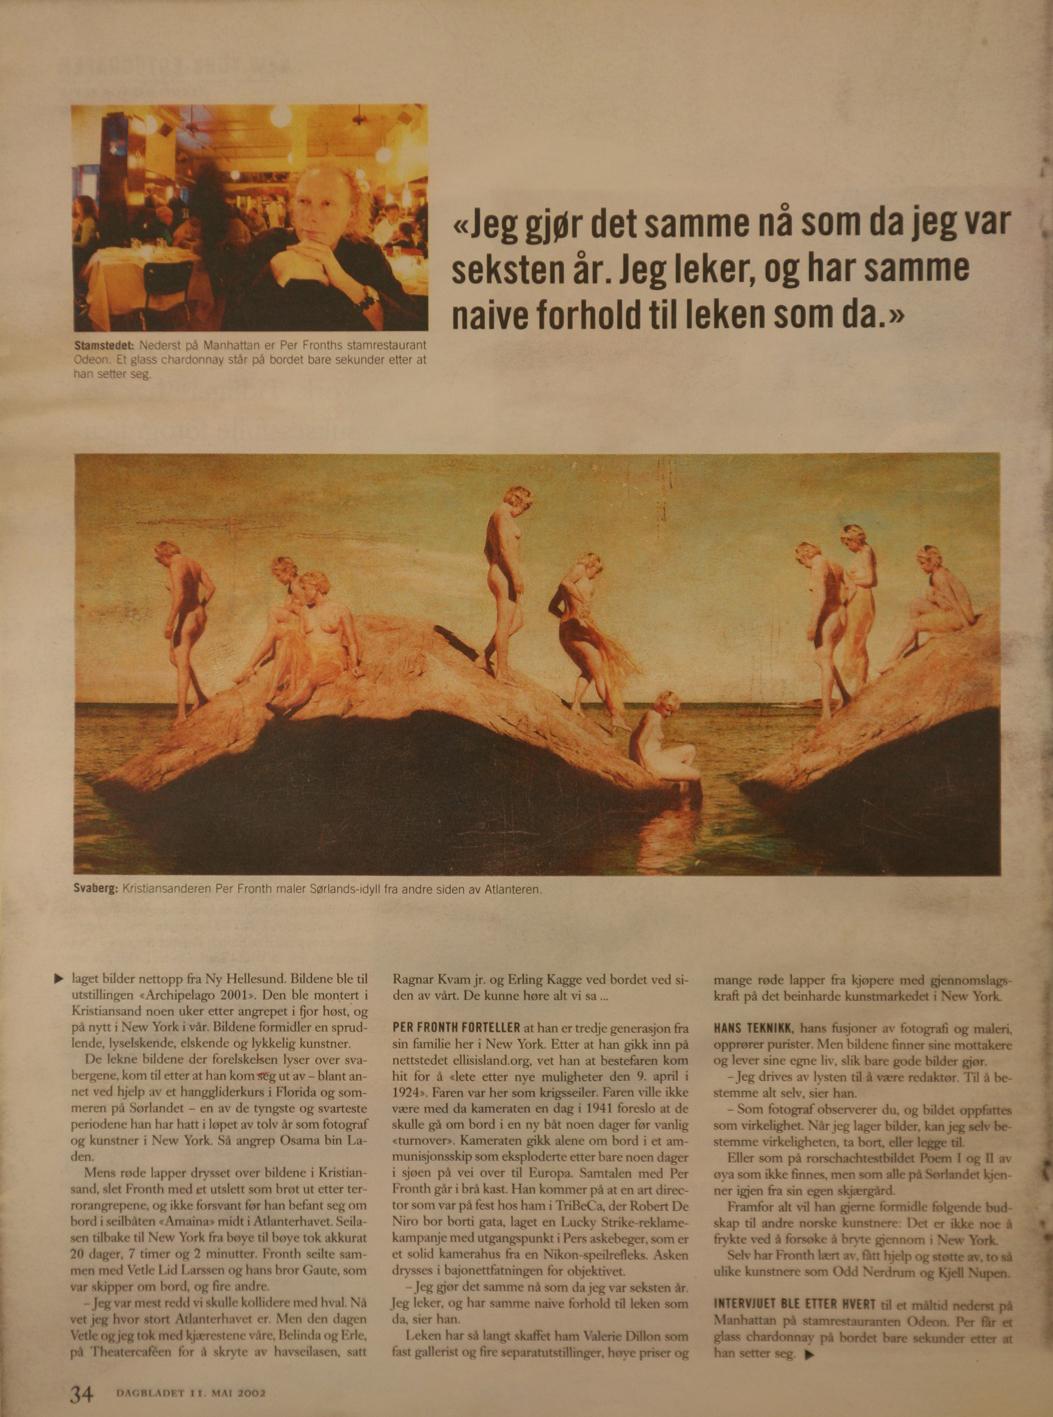 db.magasinet.2002.34.jpg